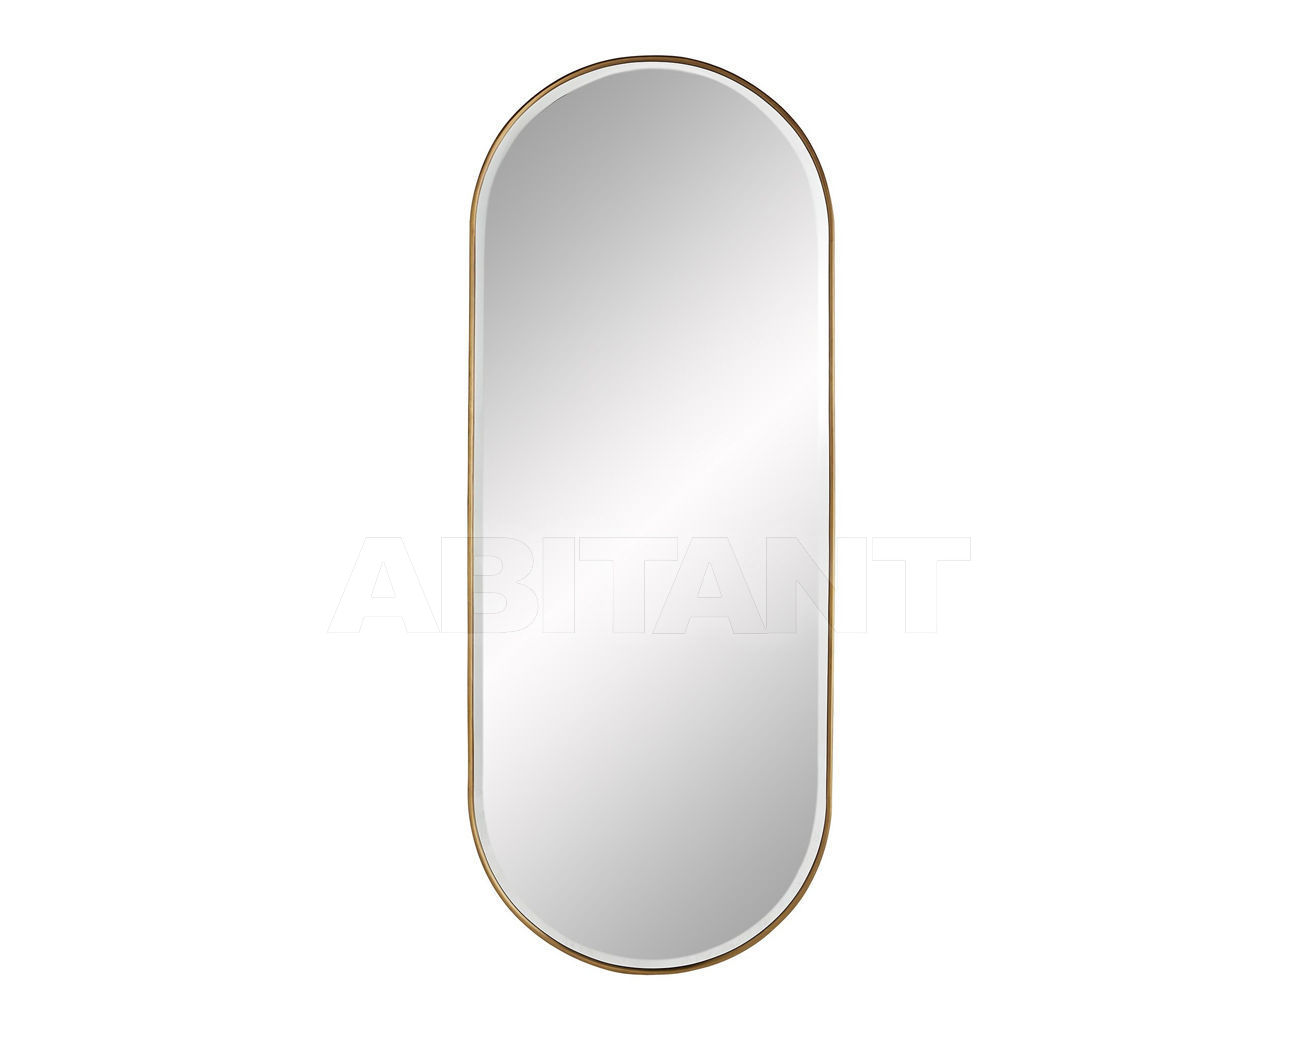 Купить Зеркало настенное Vaquero Arteriors Home  MIRRORS 6778